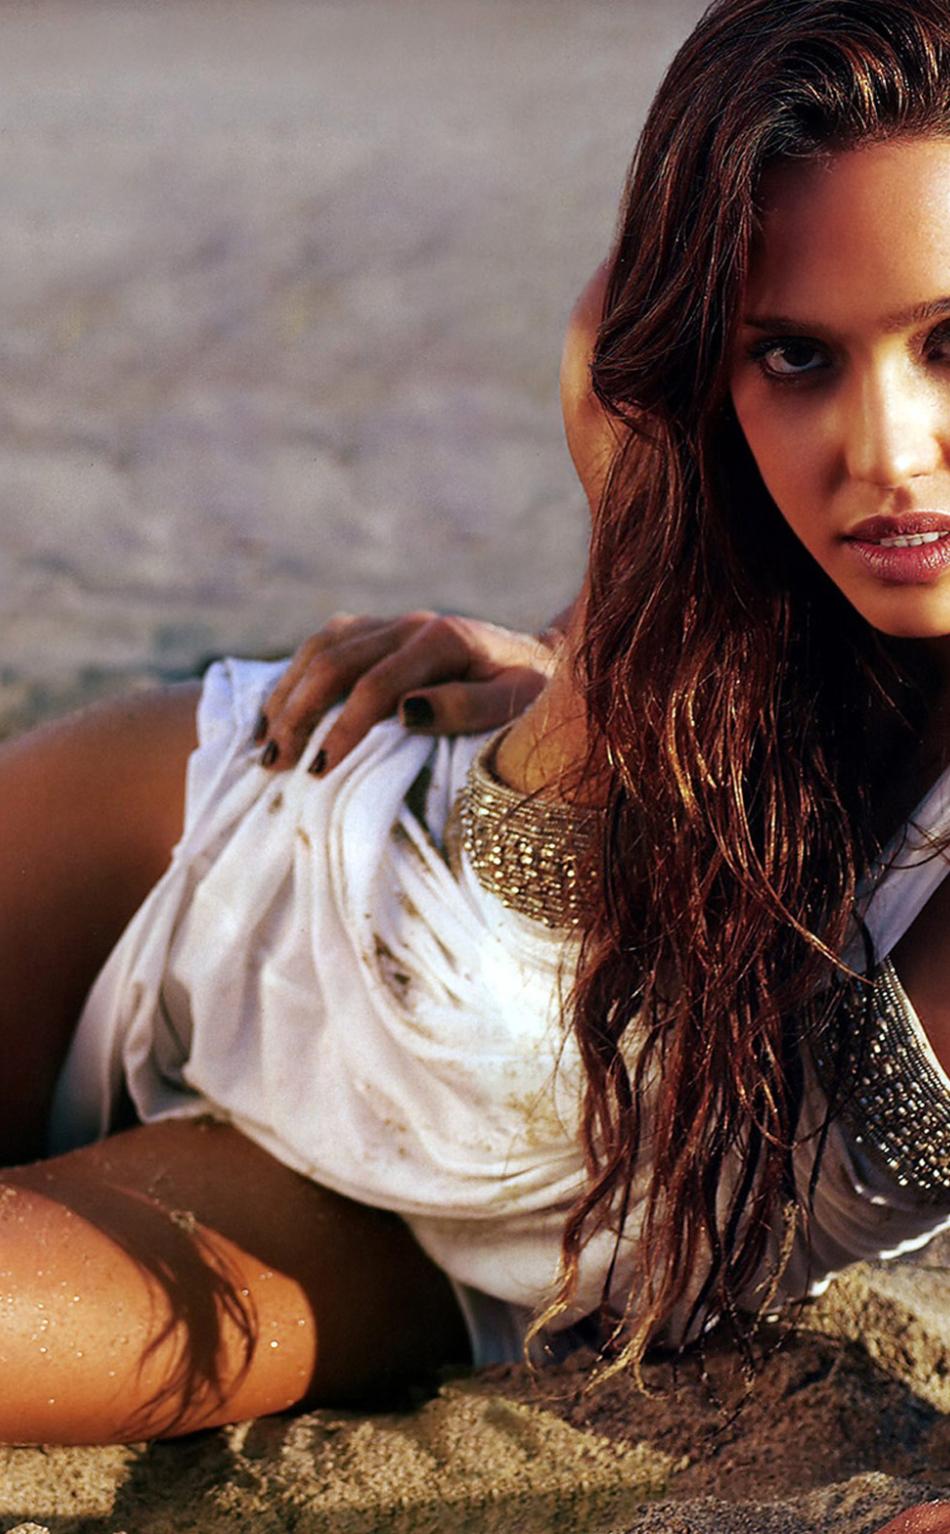 Jessica alba hot photoshoot full hd 2k wallpaper - Jessica alba desktop wallpaper ...